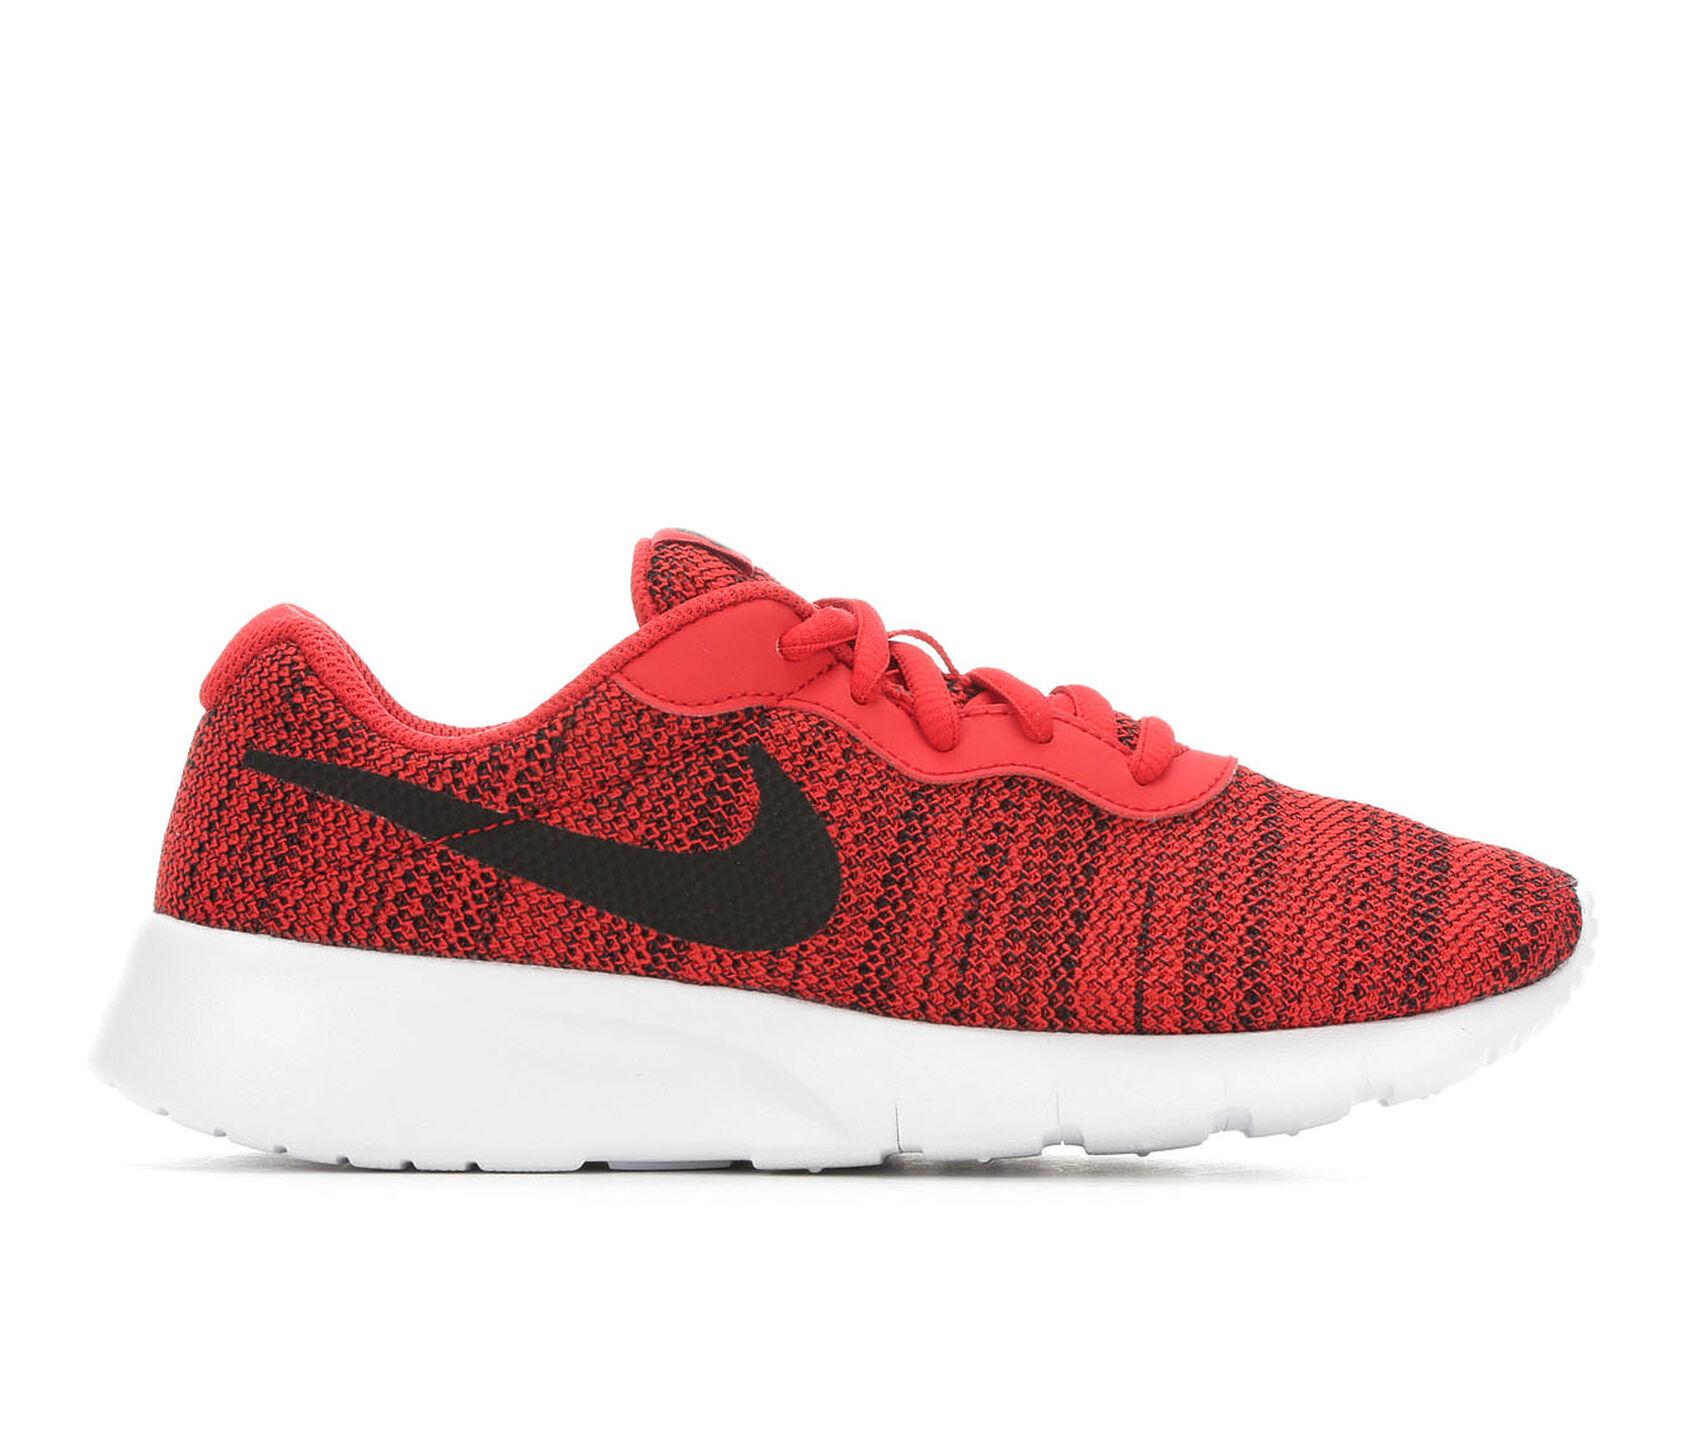 hot sale online 02972 a40a9 Kids  Nike Big Kid Tanjun Sneakers   Shoe Carnival